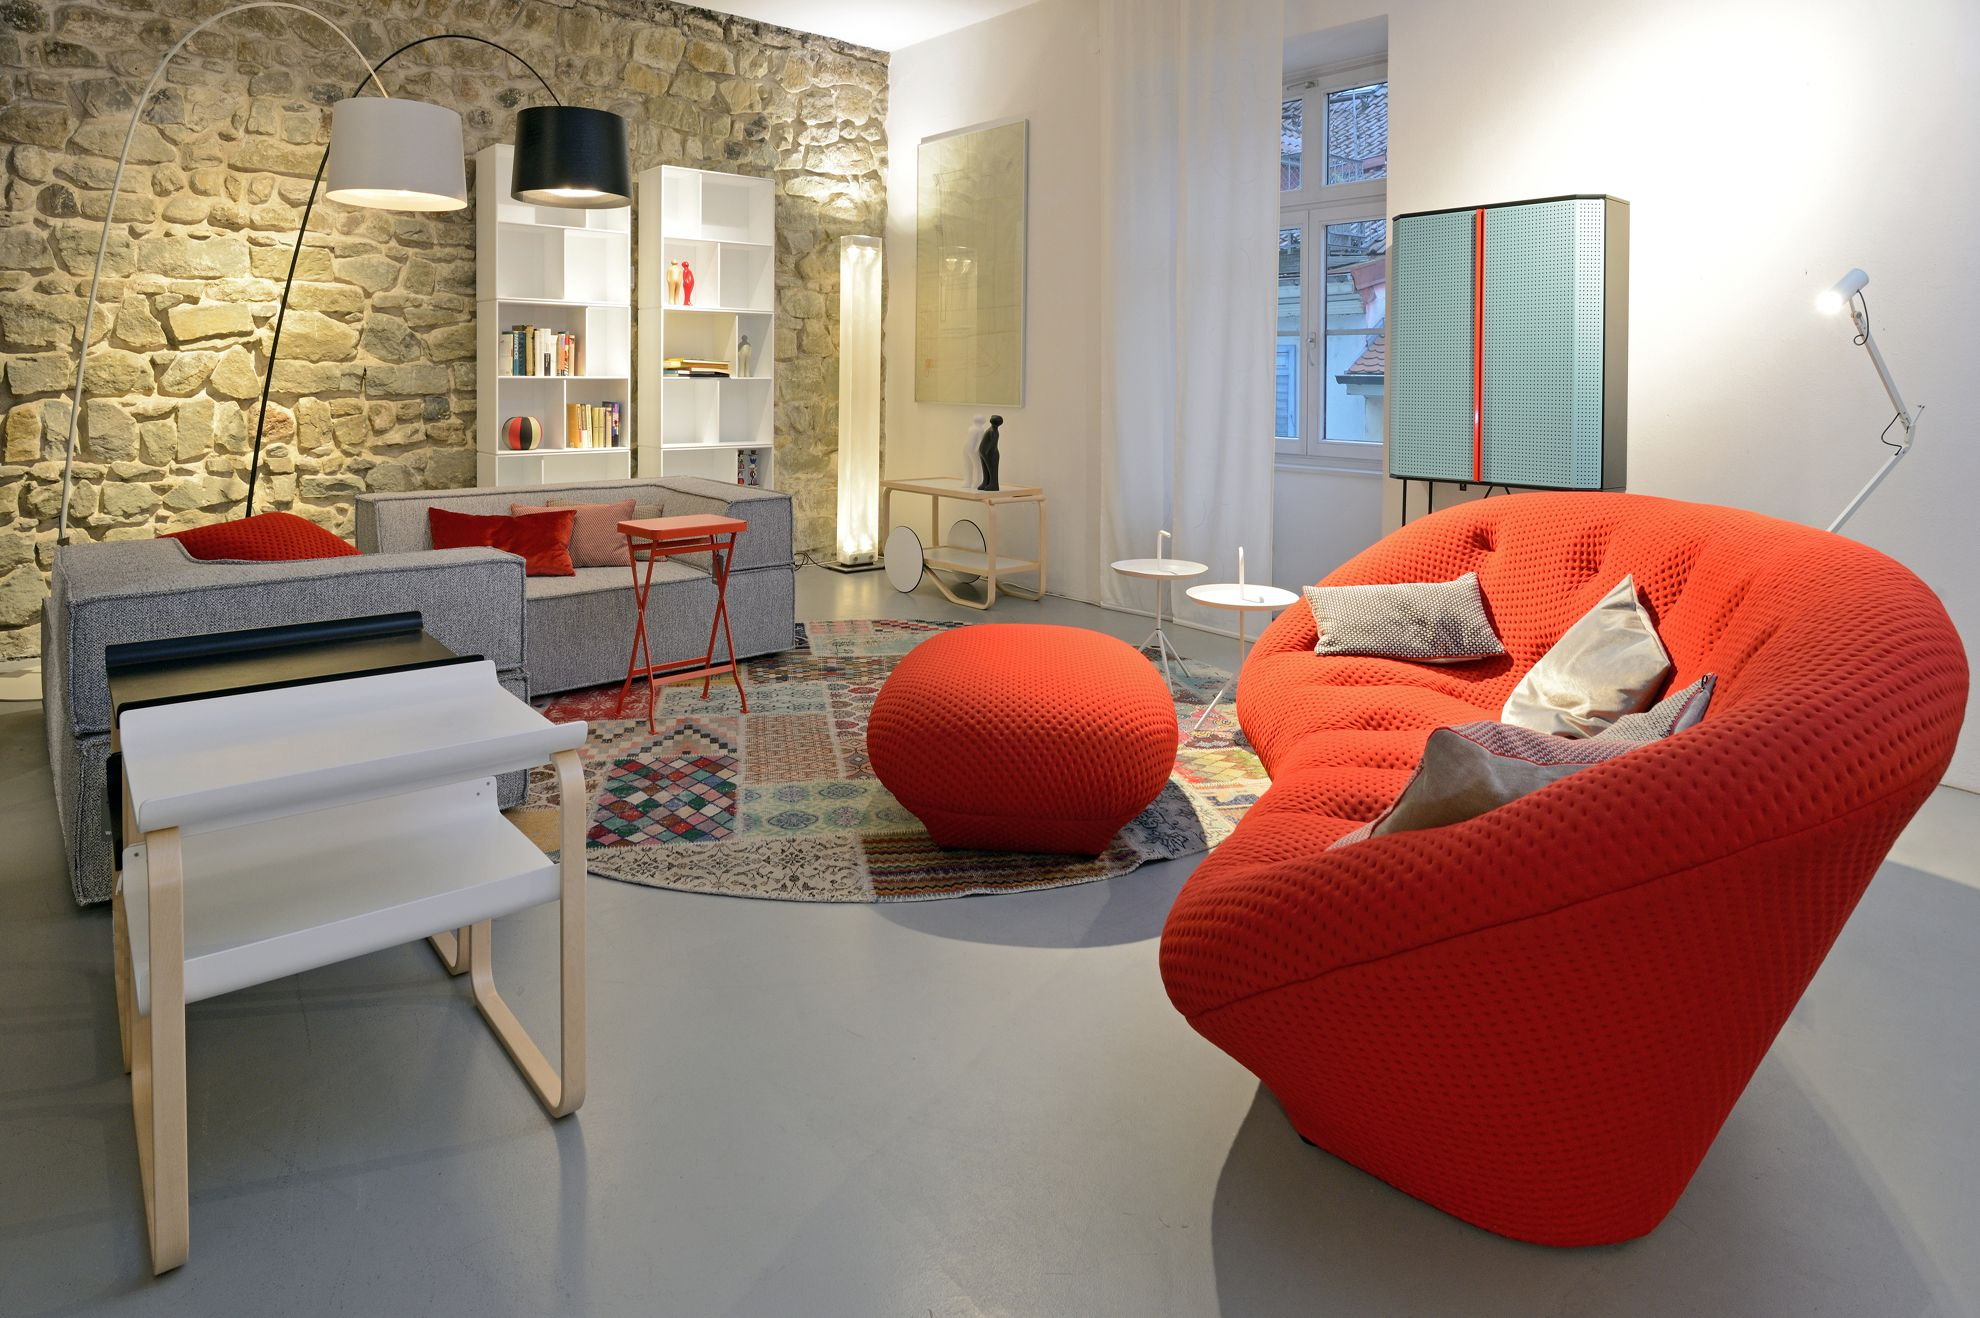 Sofa grau cor sofa rot ligne roset wohnzimmer pinterest sofa grau cor sofa rot ligne roset parisarafo Gallery